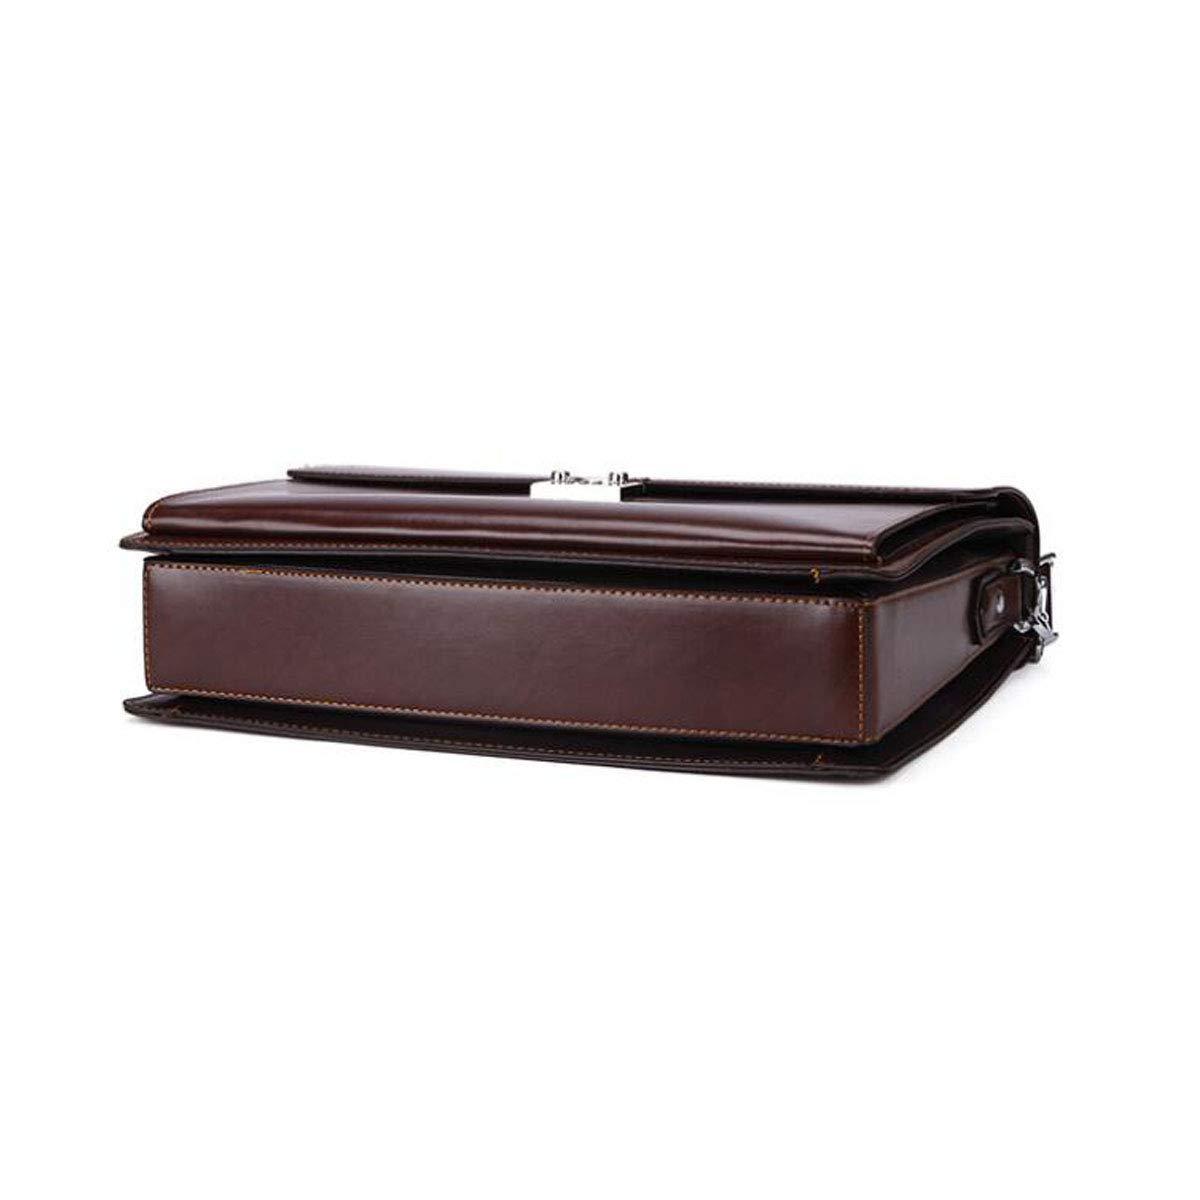 36 9 29cm Briefcase with anti-theft password lock black size